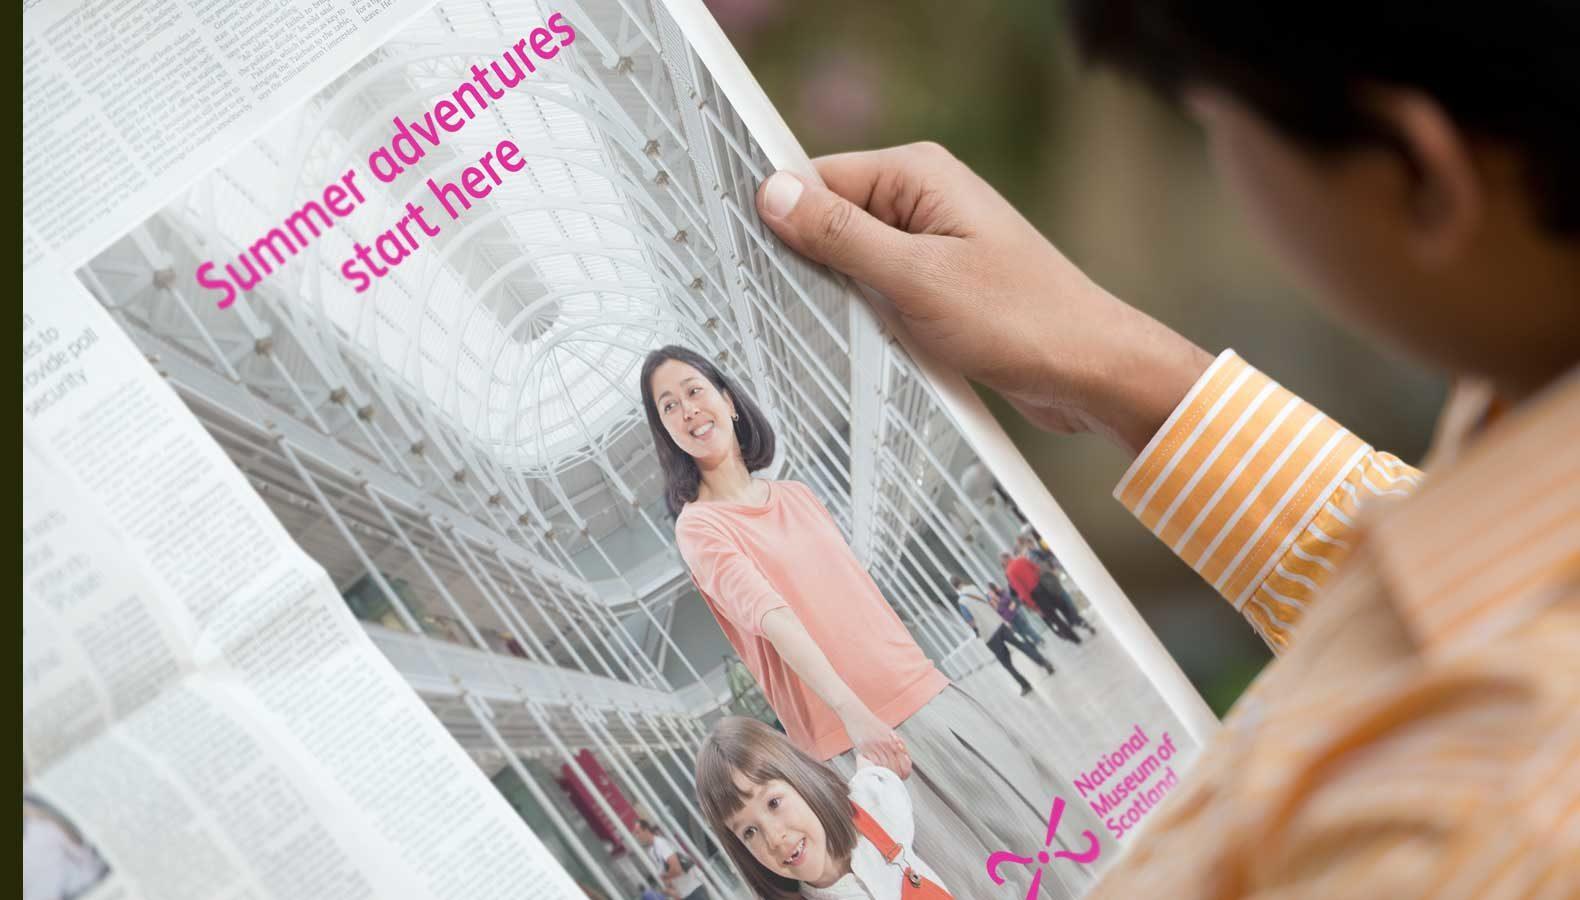 Newspaper advertising for museum